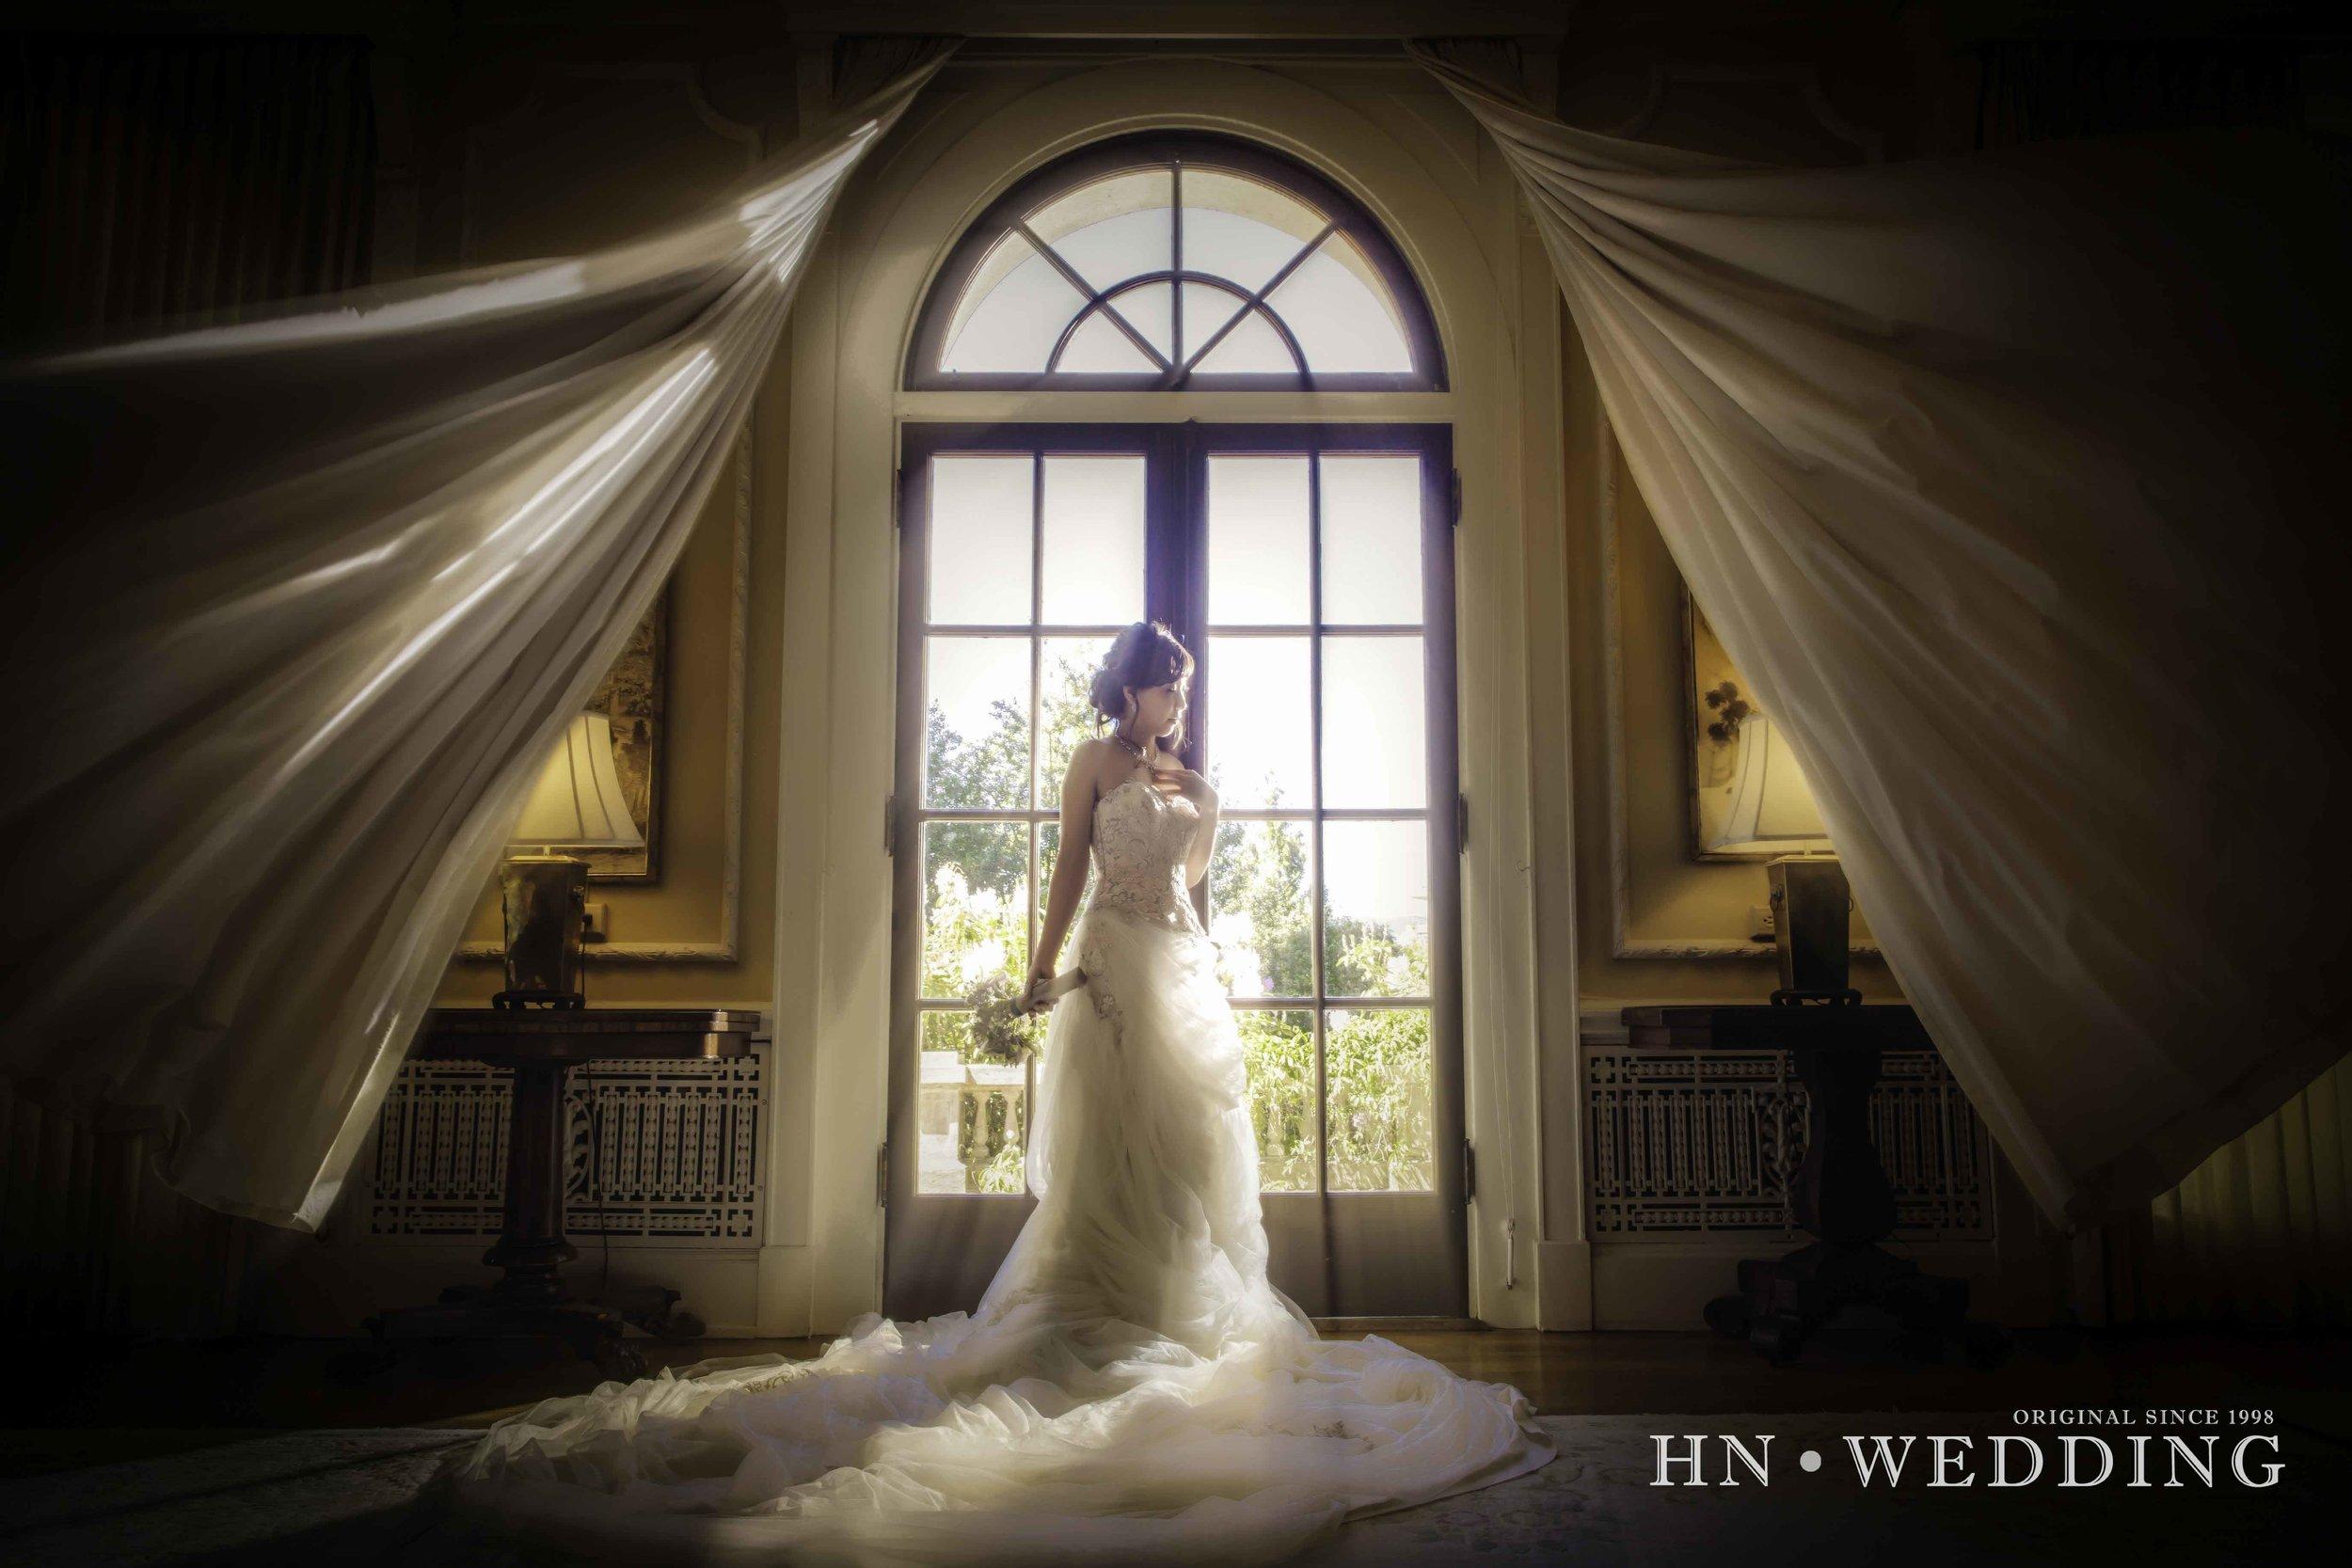 HNwedding-20170630-prewedding-2-2.jpg